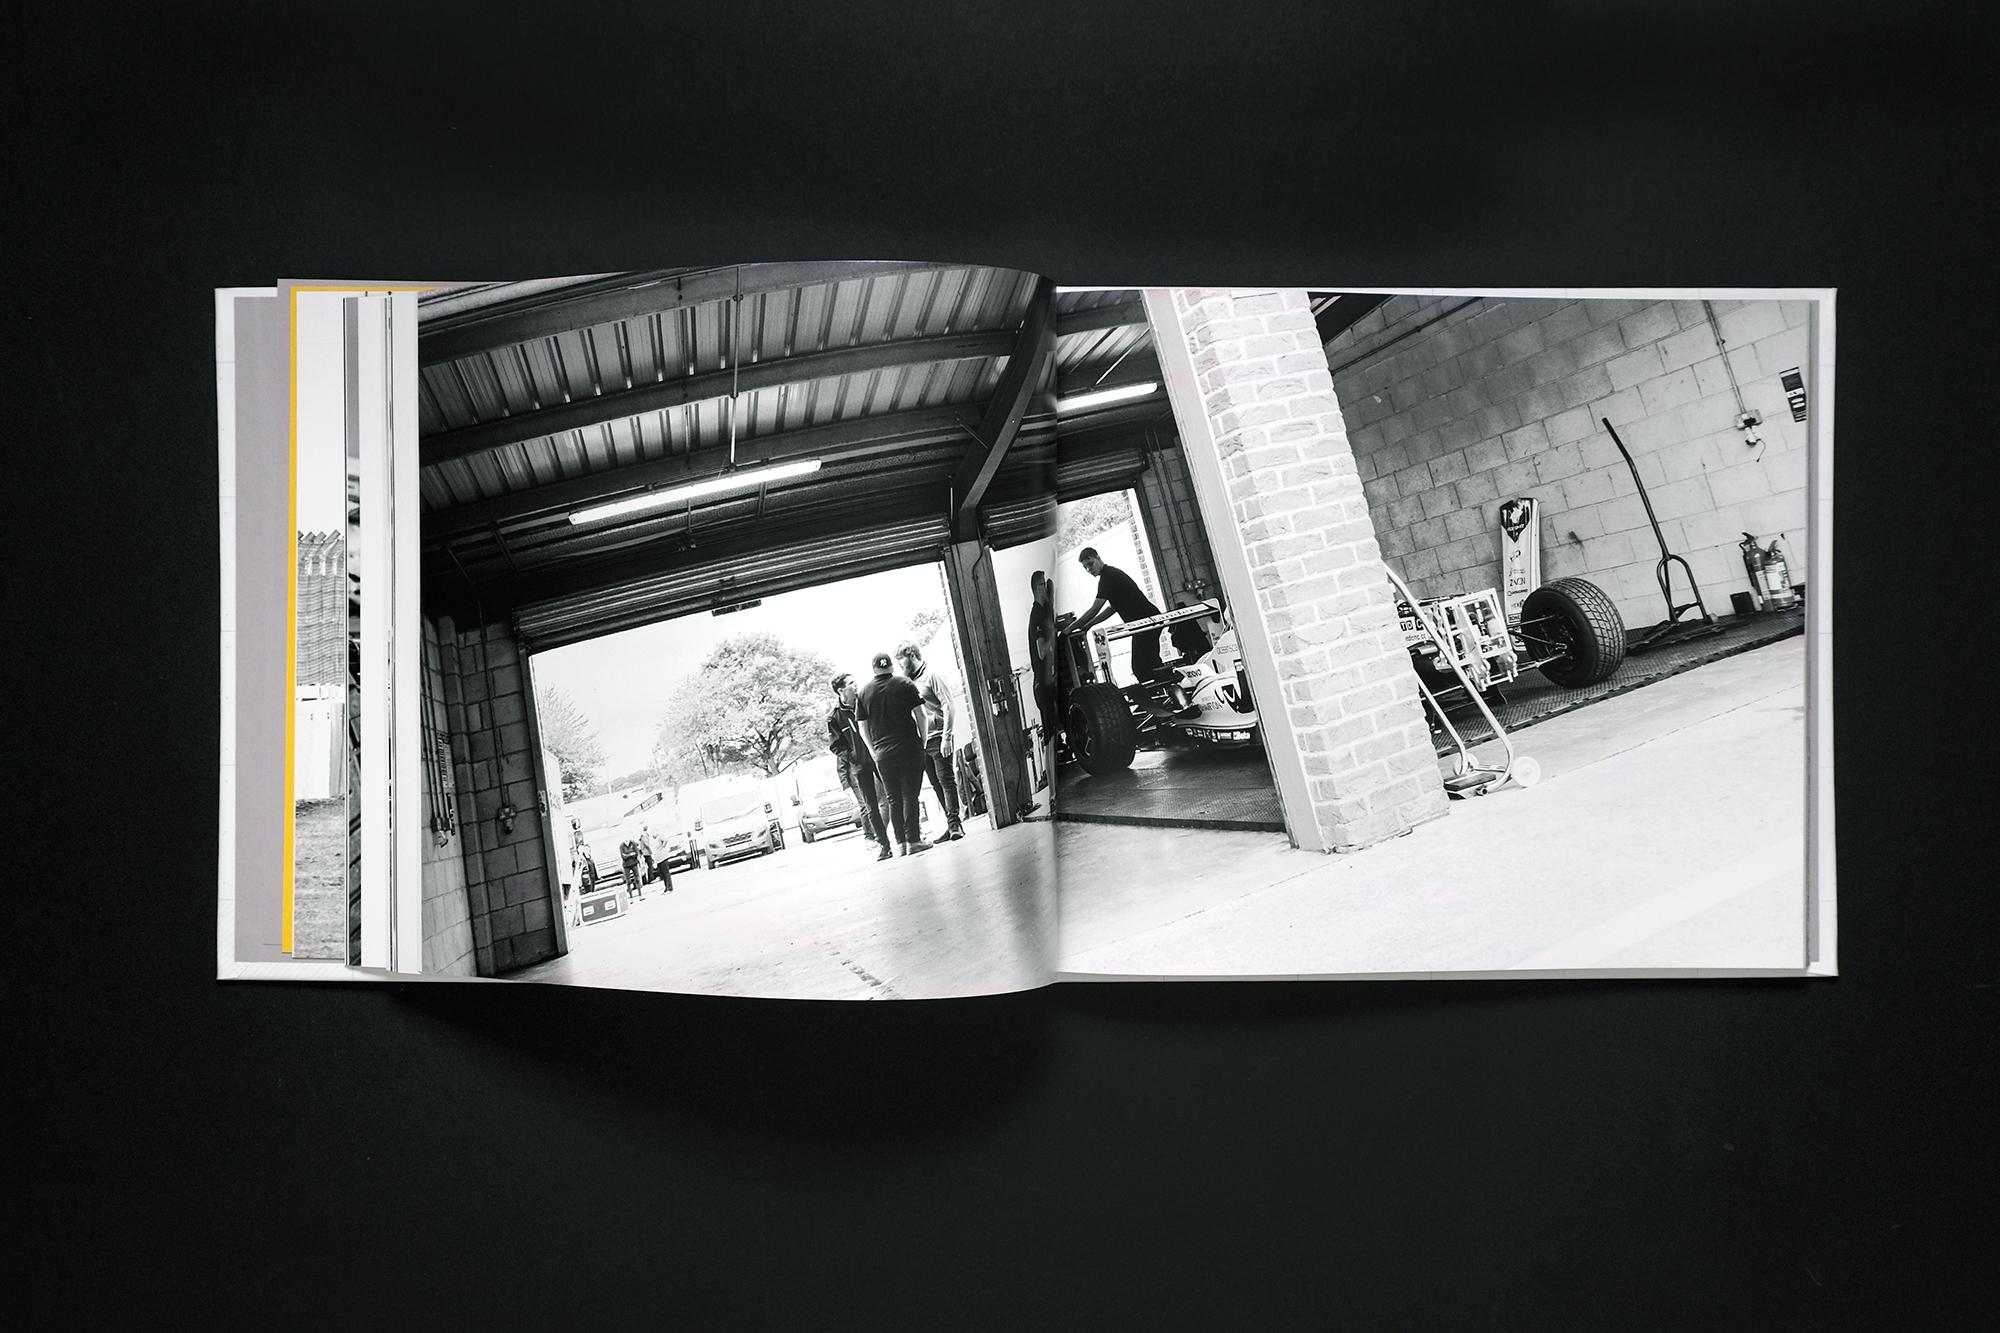 https://rusyndesign.co.uk/wp-content/uploads/2020/04/UWR-19-book-shots-10.jpg